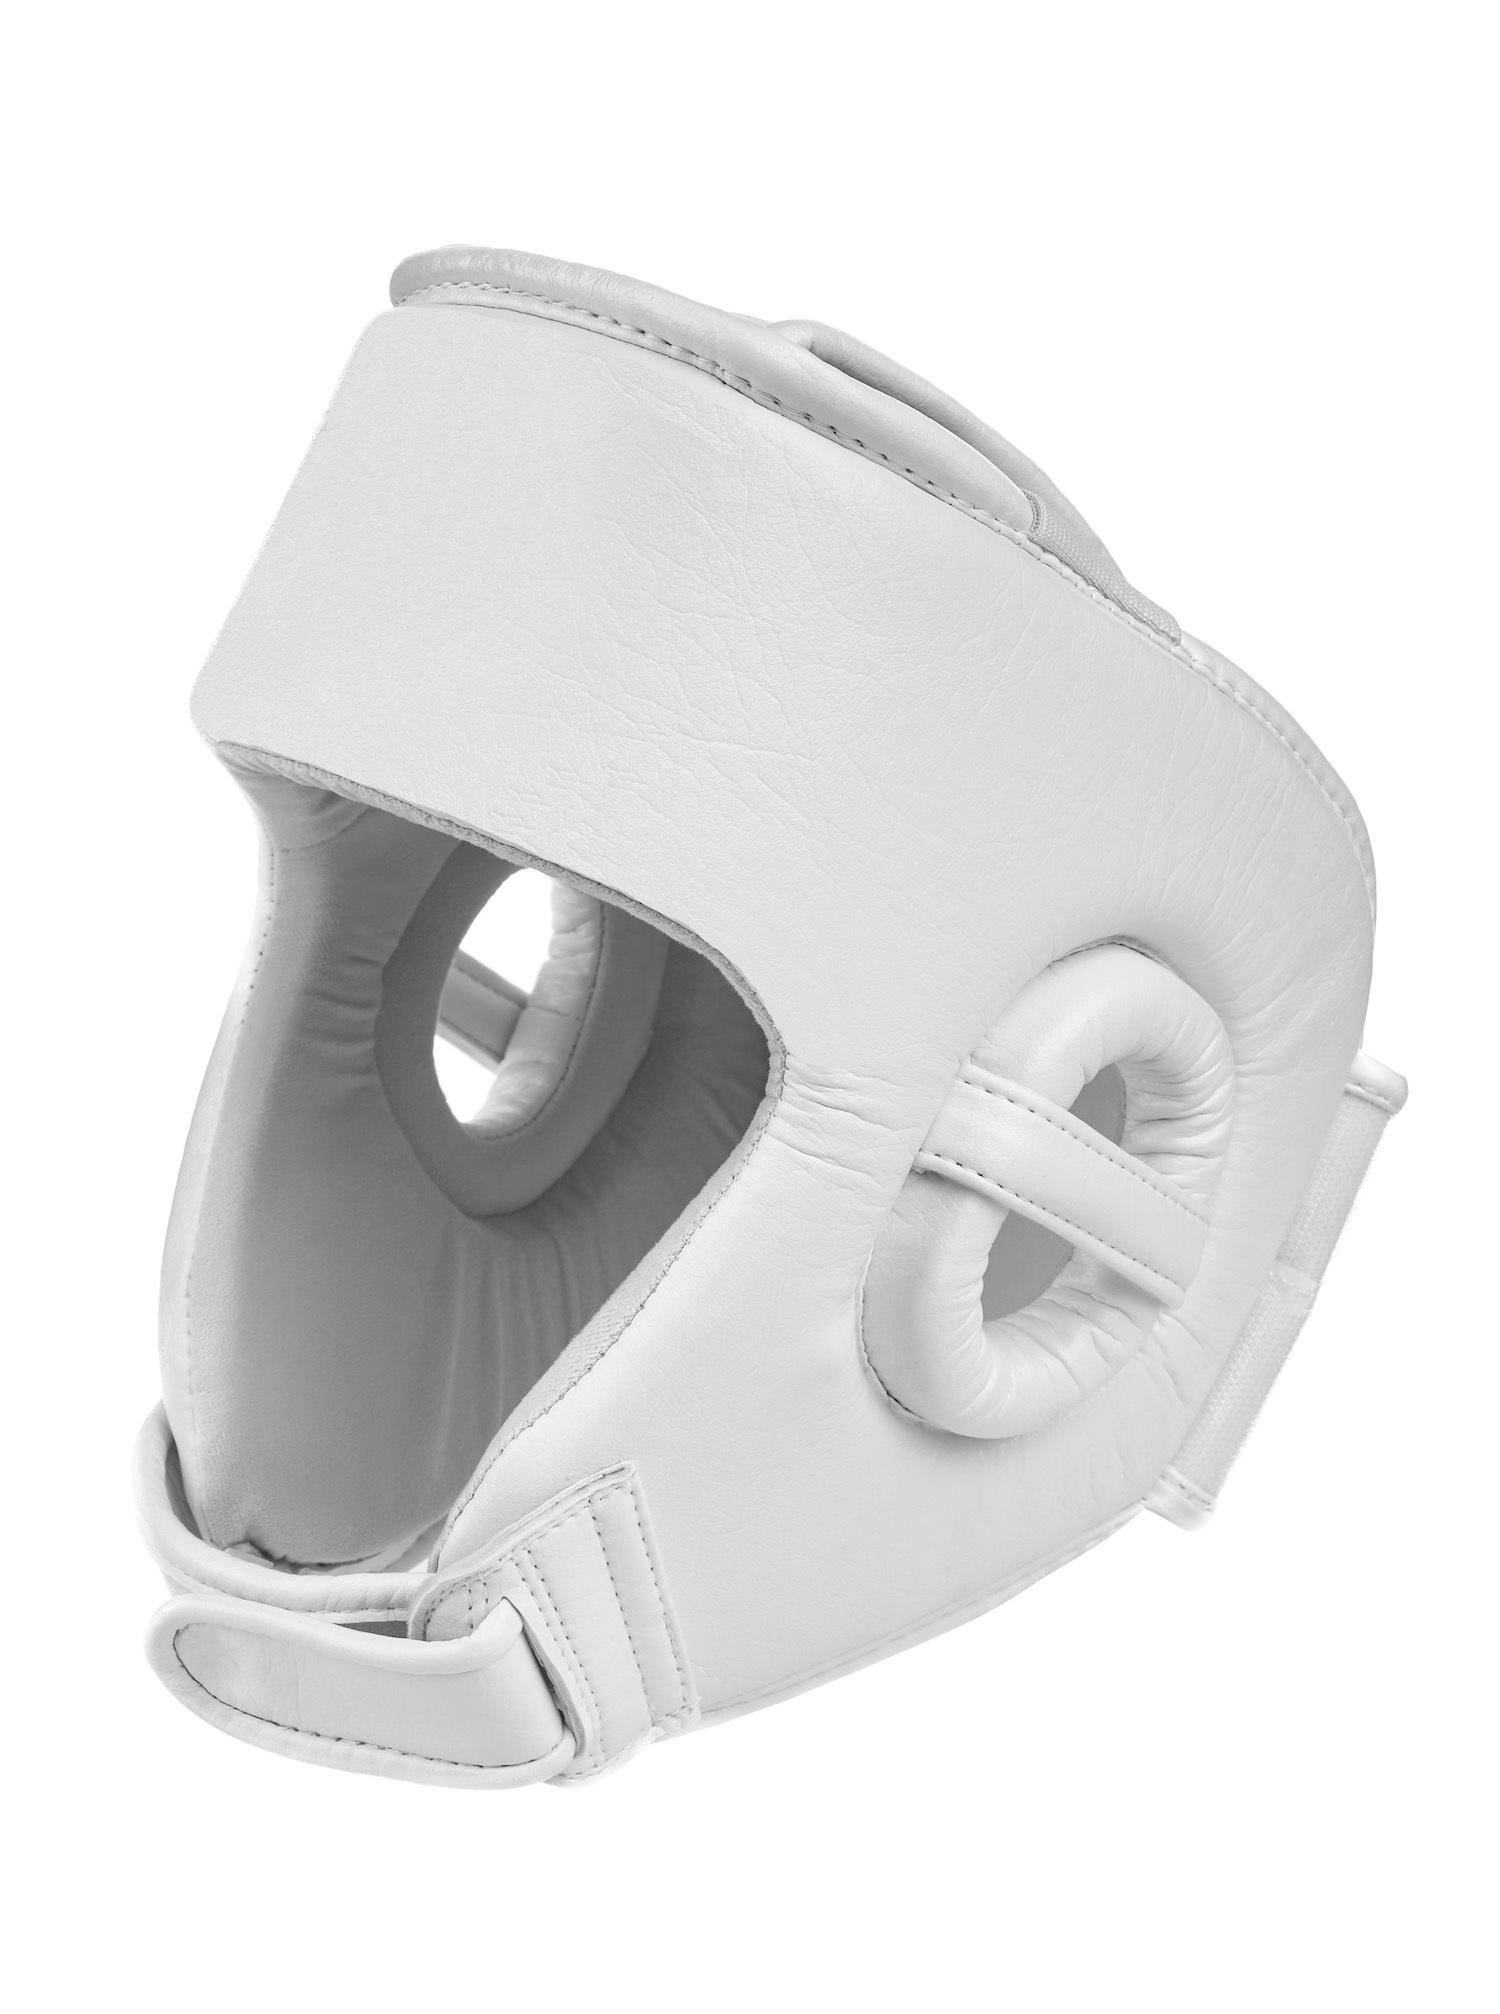 Шлемы Шлем BFS - Открытый / Medium IP-17-1.jpg